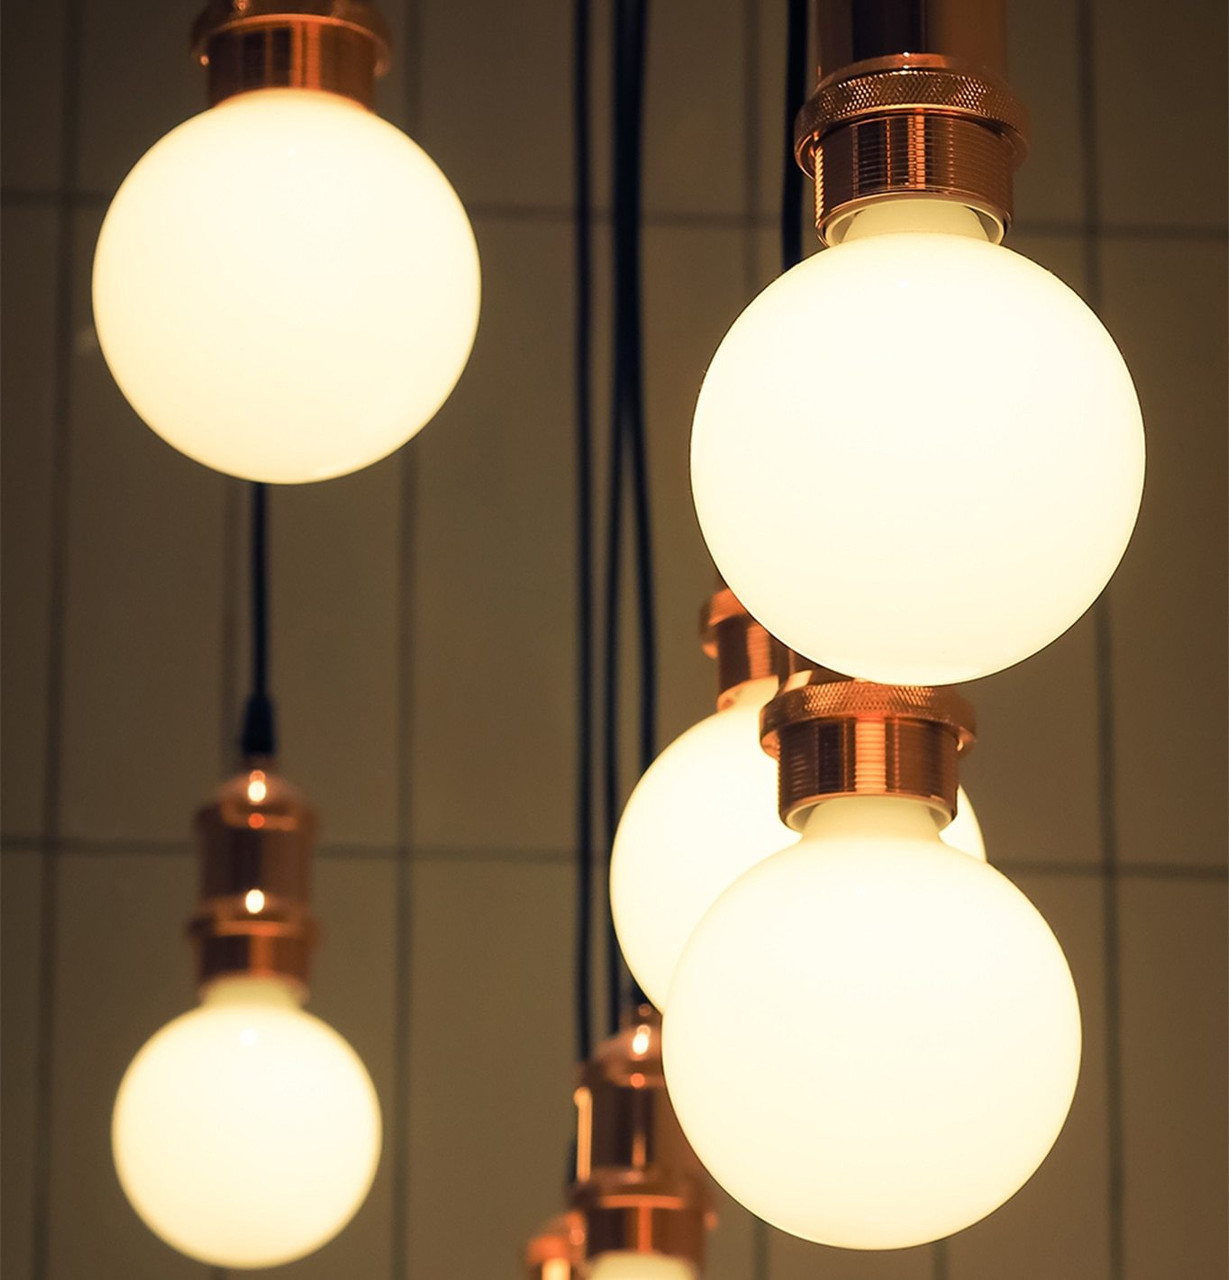 Crompton Lamps LED Globe BC-B22d Light Bulbs